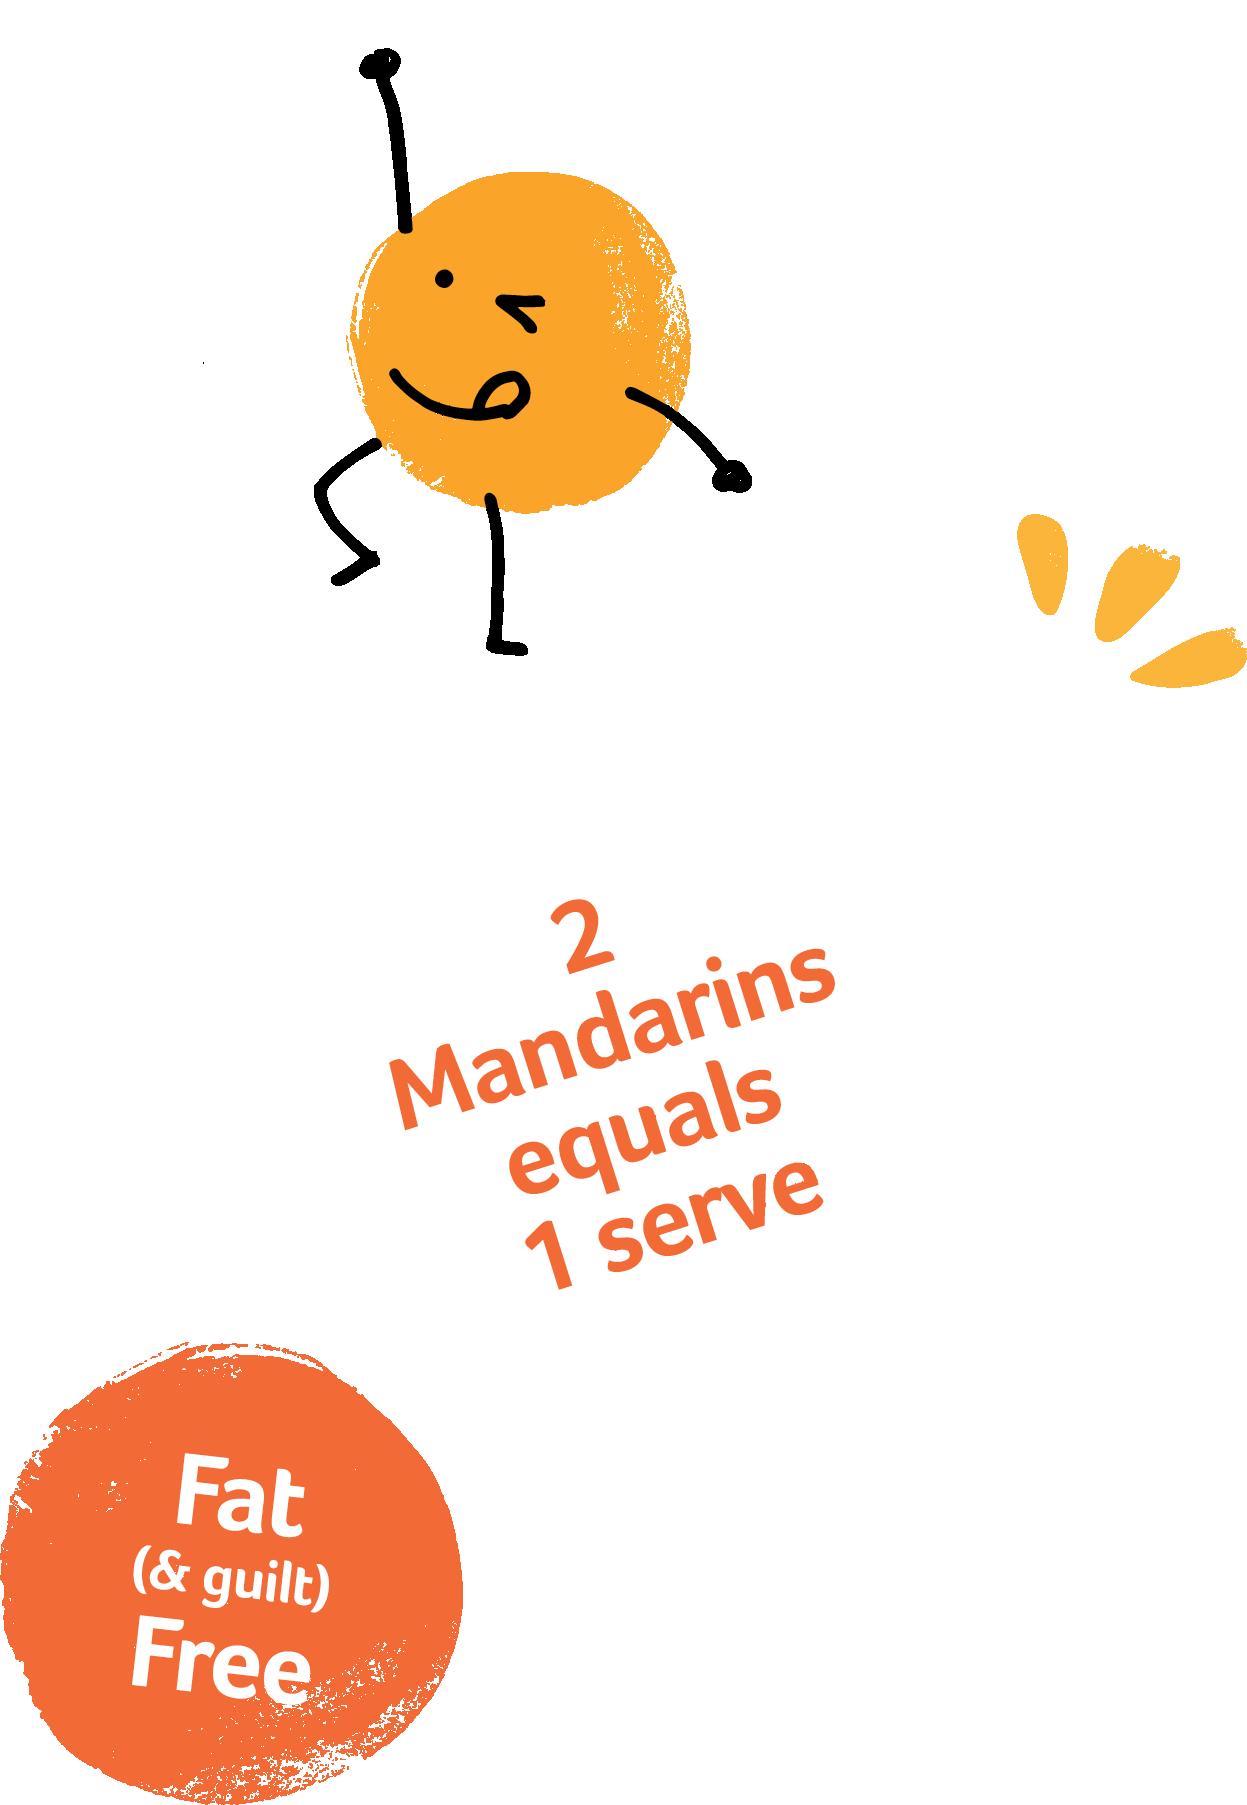 About Summerina Mandarins